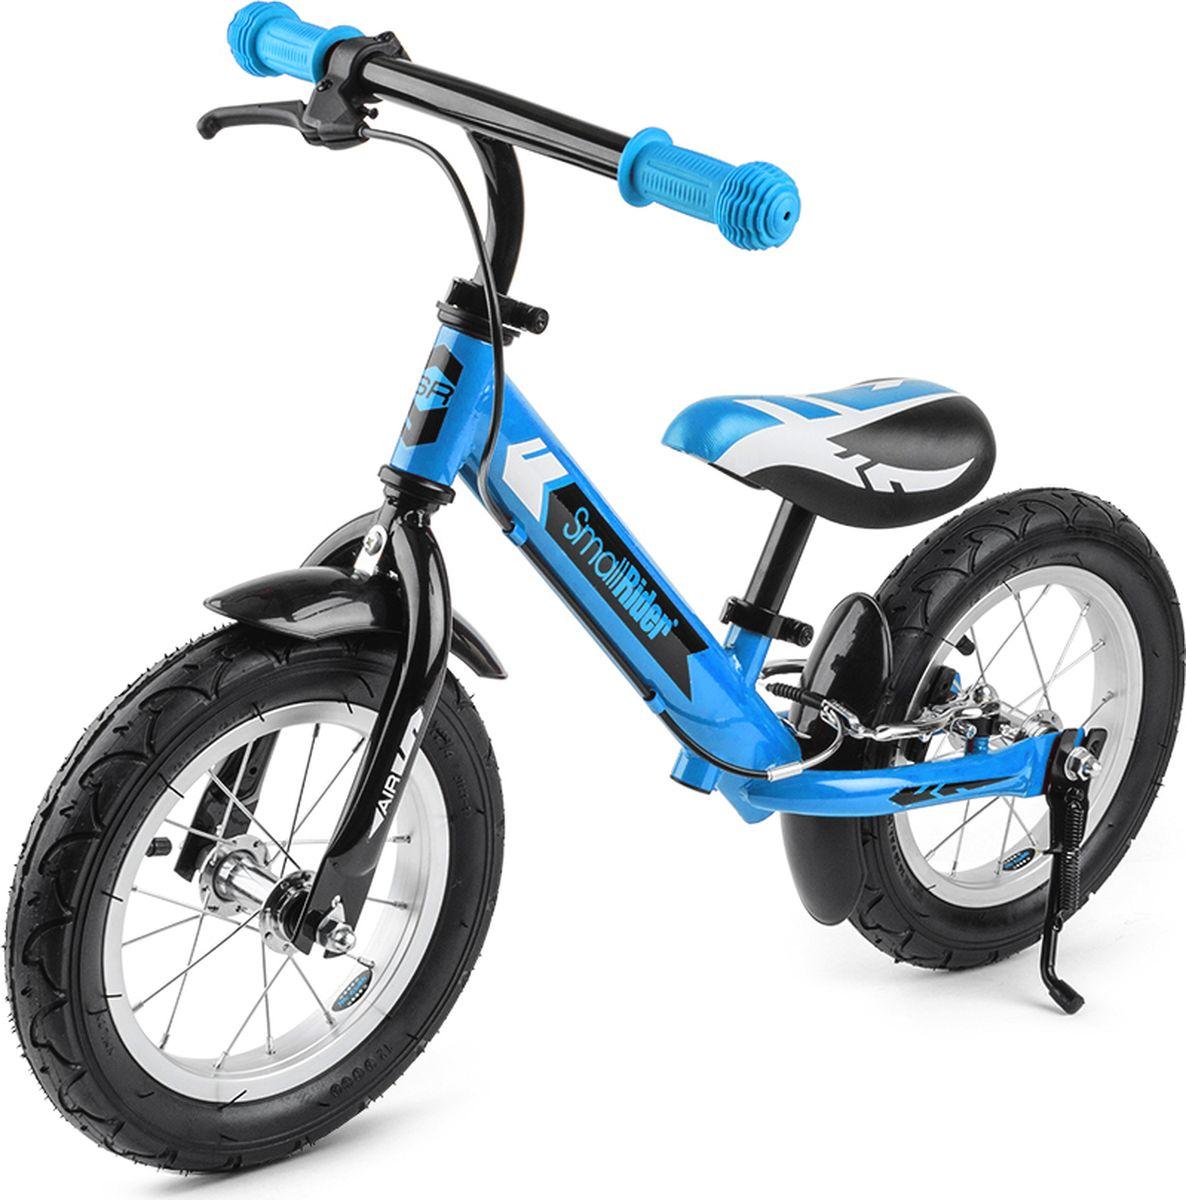 Small Rider Беговел детский Roadster Air цвет синий - Беговелы